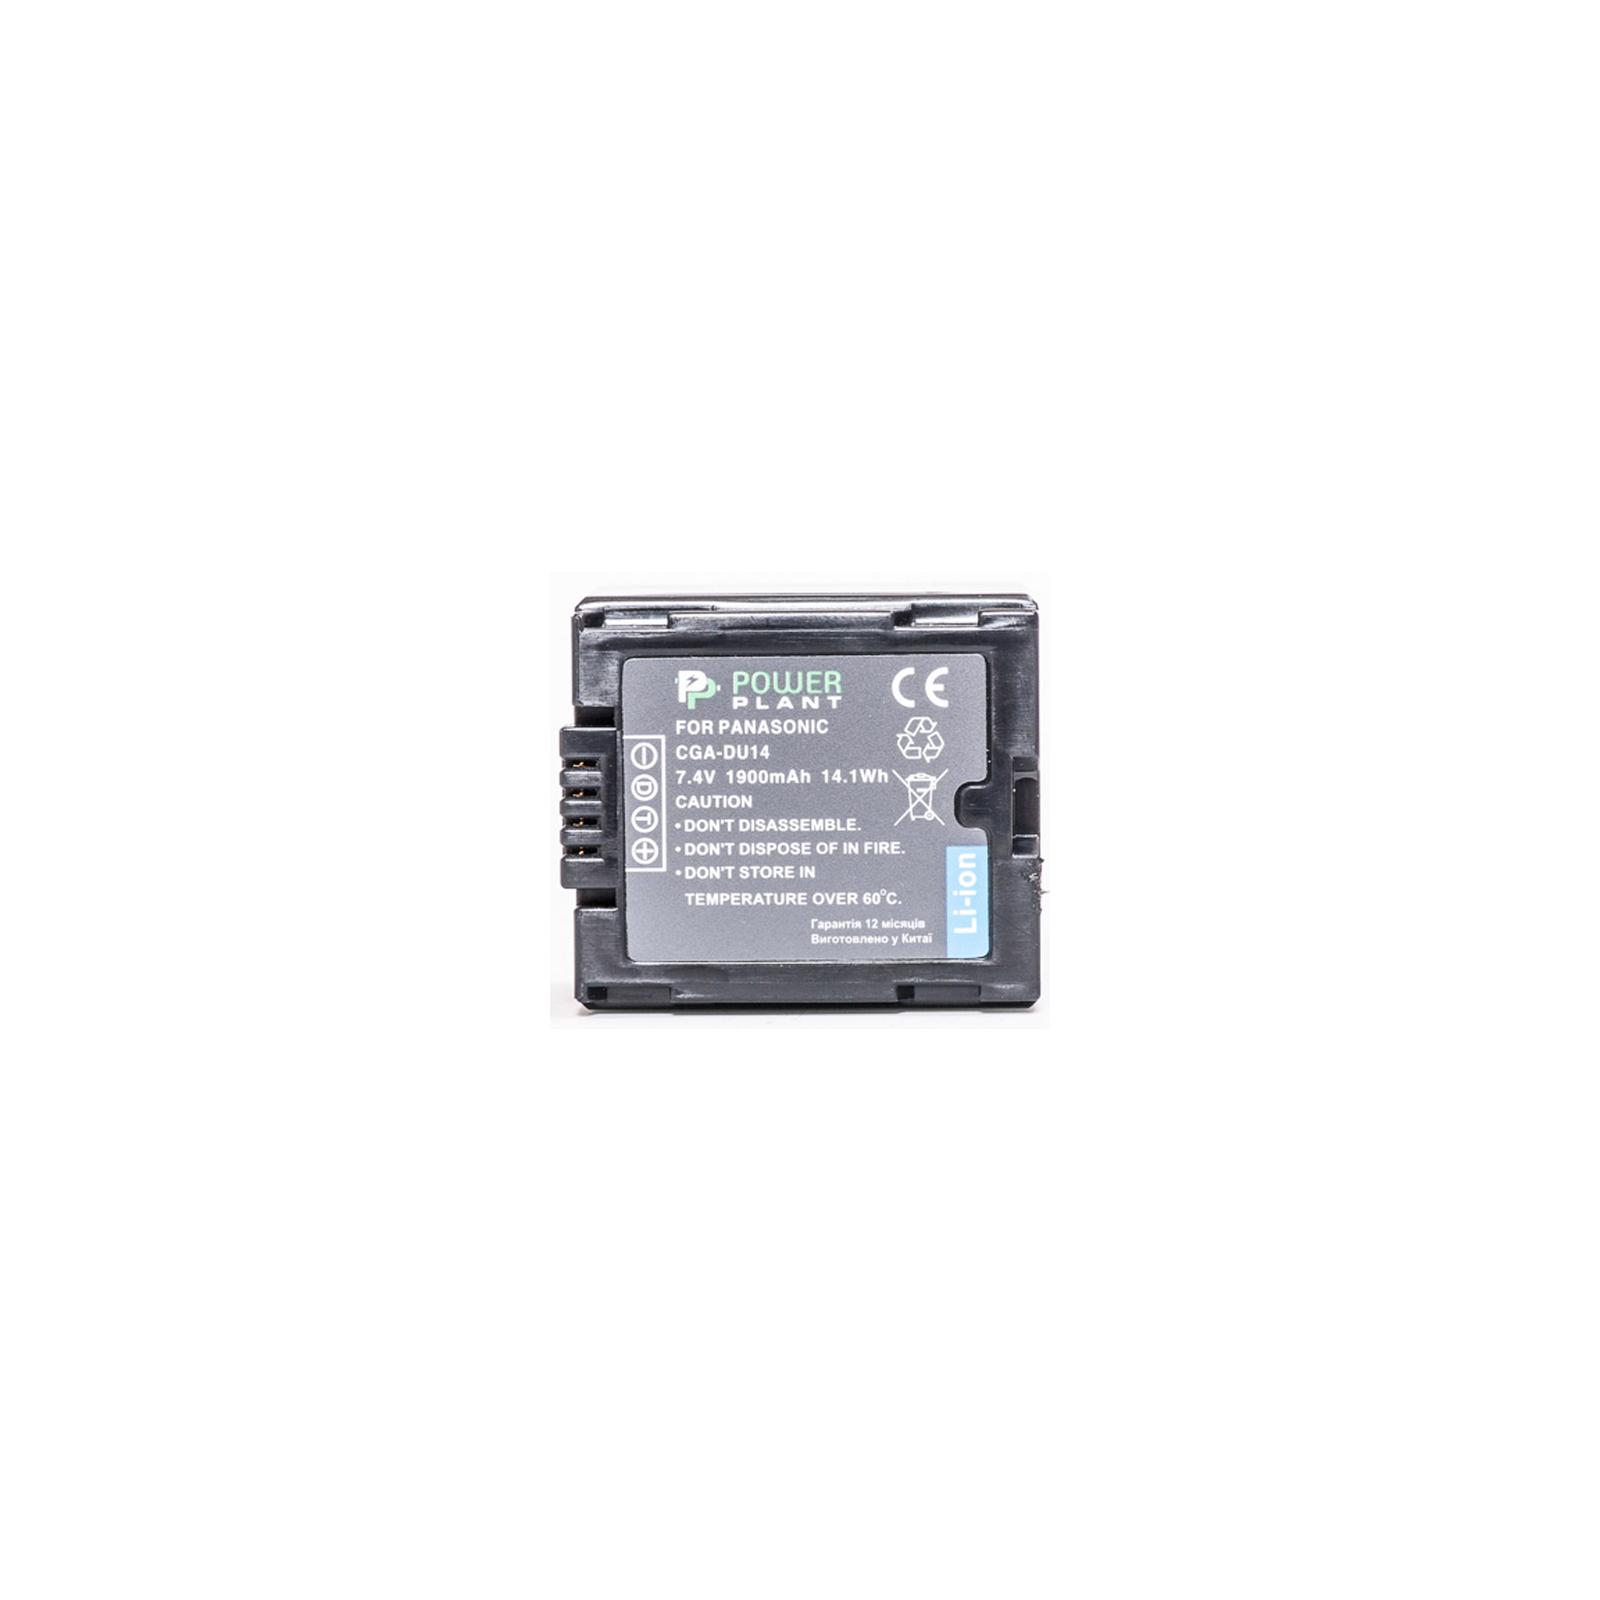 Аккумулятор к фото/видео Panasonic CGA-DU14 PowerPlant (DV00DV1182) изображение 2